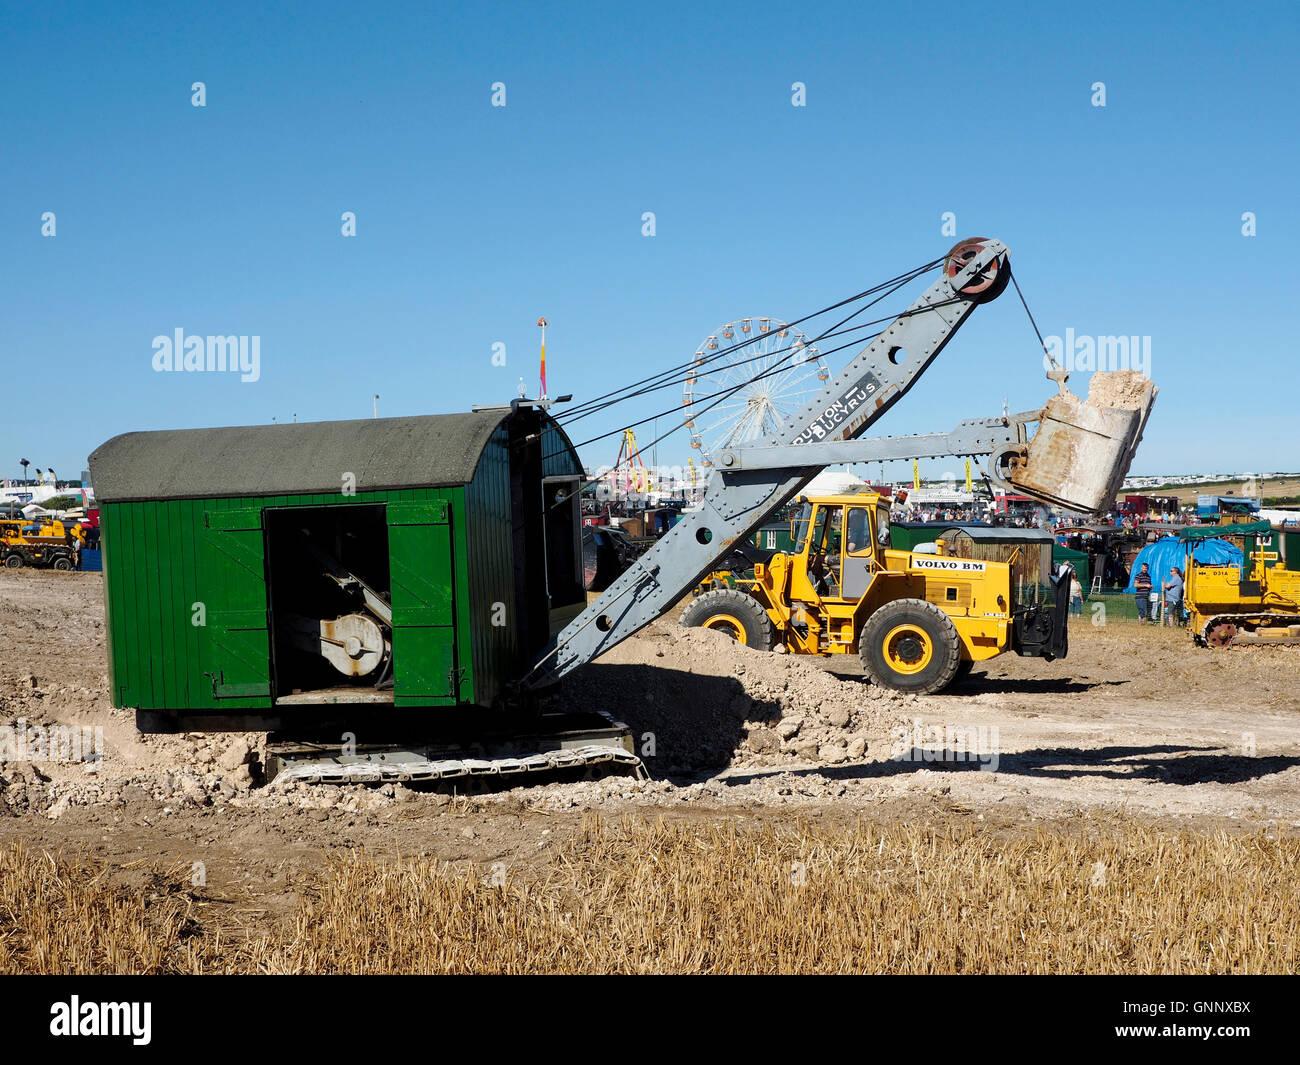 Ruston-Bucyrus No4 front shovel excavator of 1931 at Great Dorset Steam Fair 2016 - Stock Image